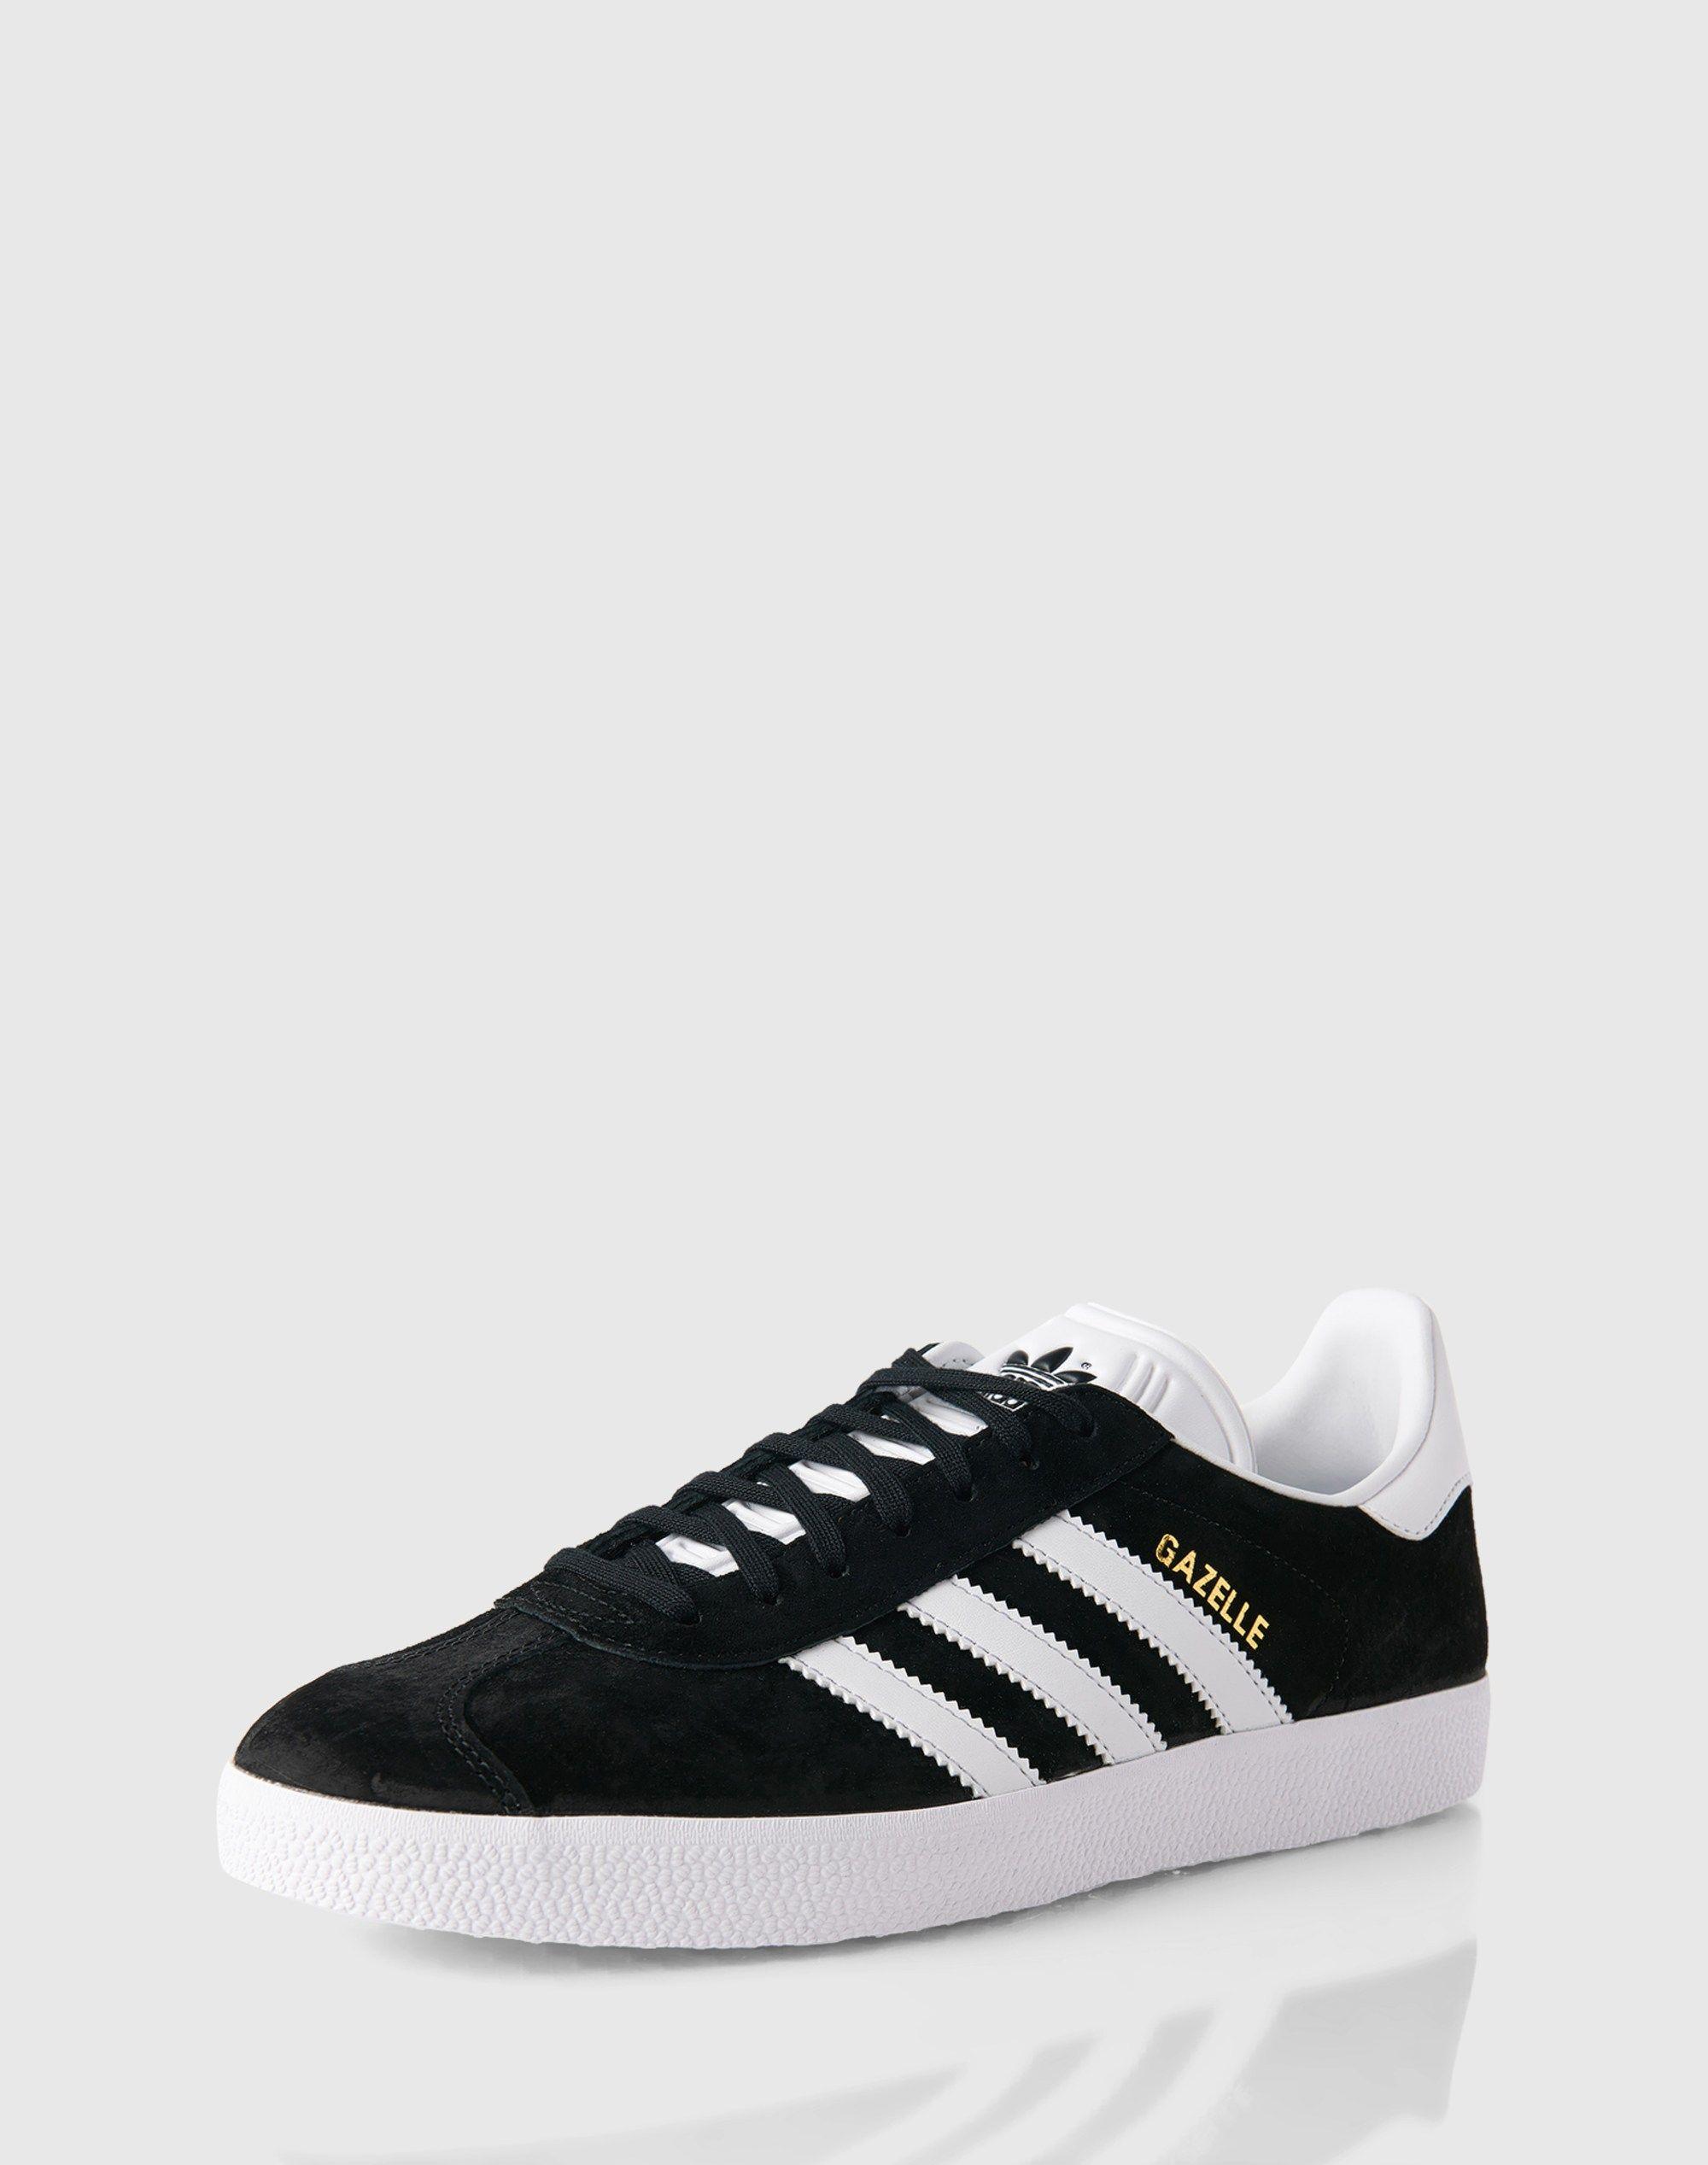 4ba03fcfc1e770 Damen ADIDAS ORIGINALS Sneaker GAZELLE schwarz weiß